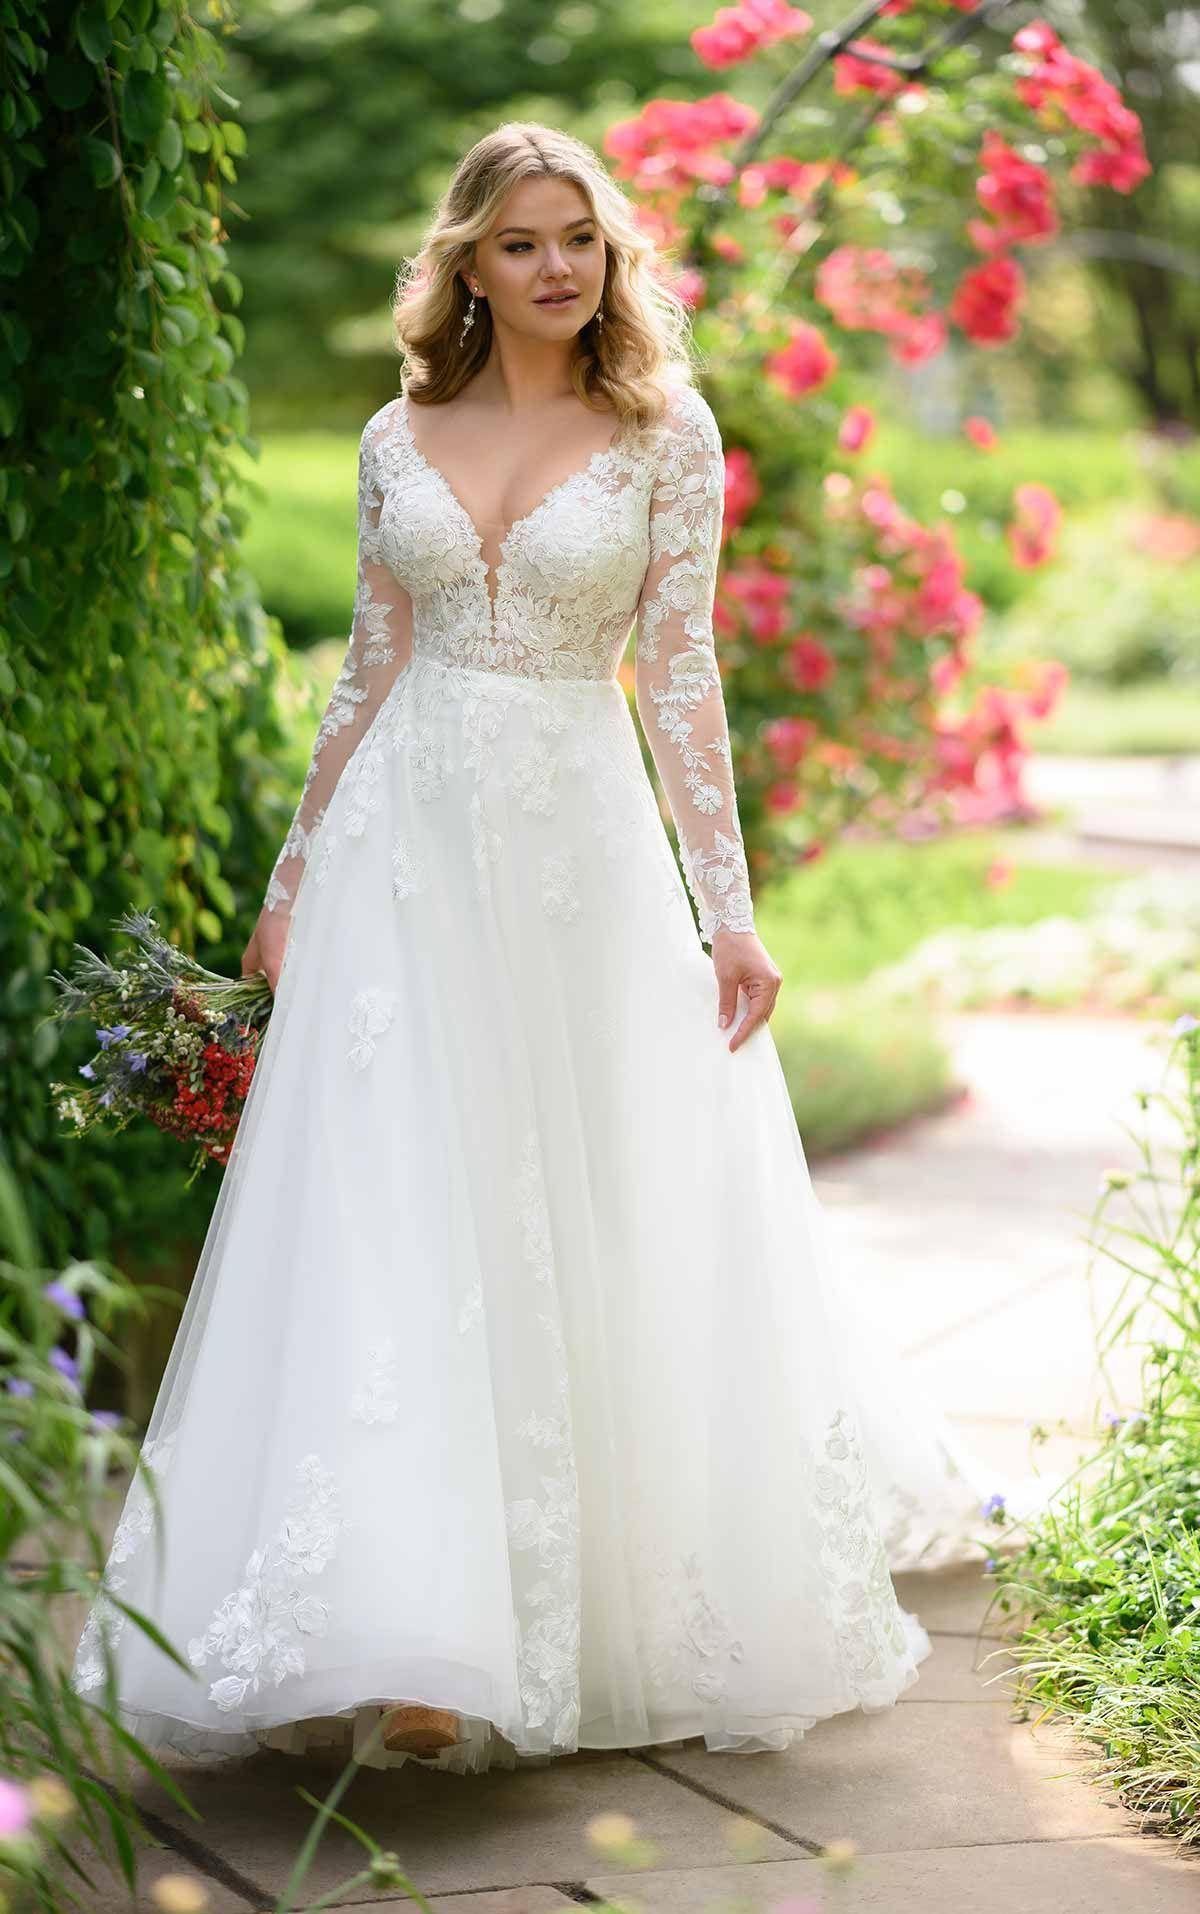 VintageInspired Organic Lace Wedding Gown Wedding